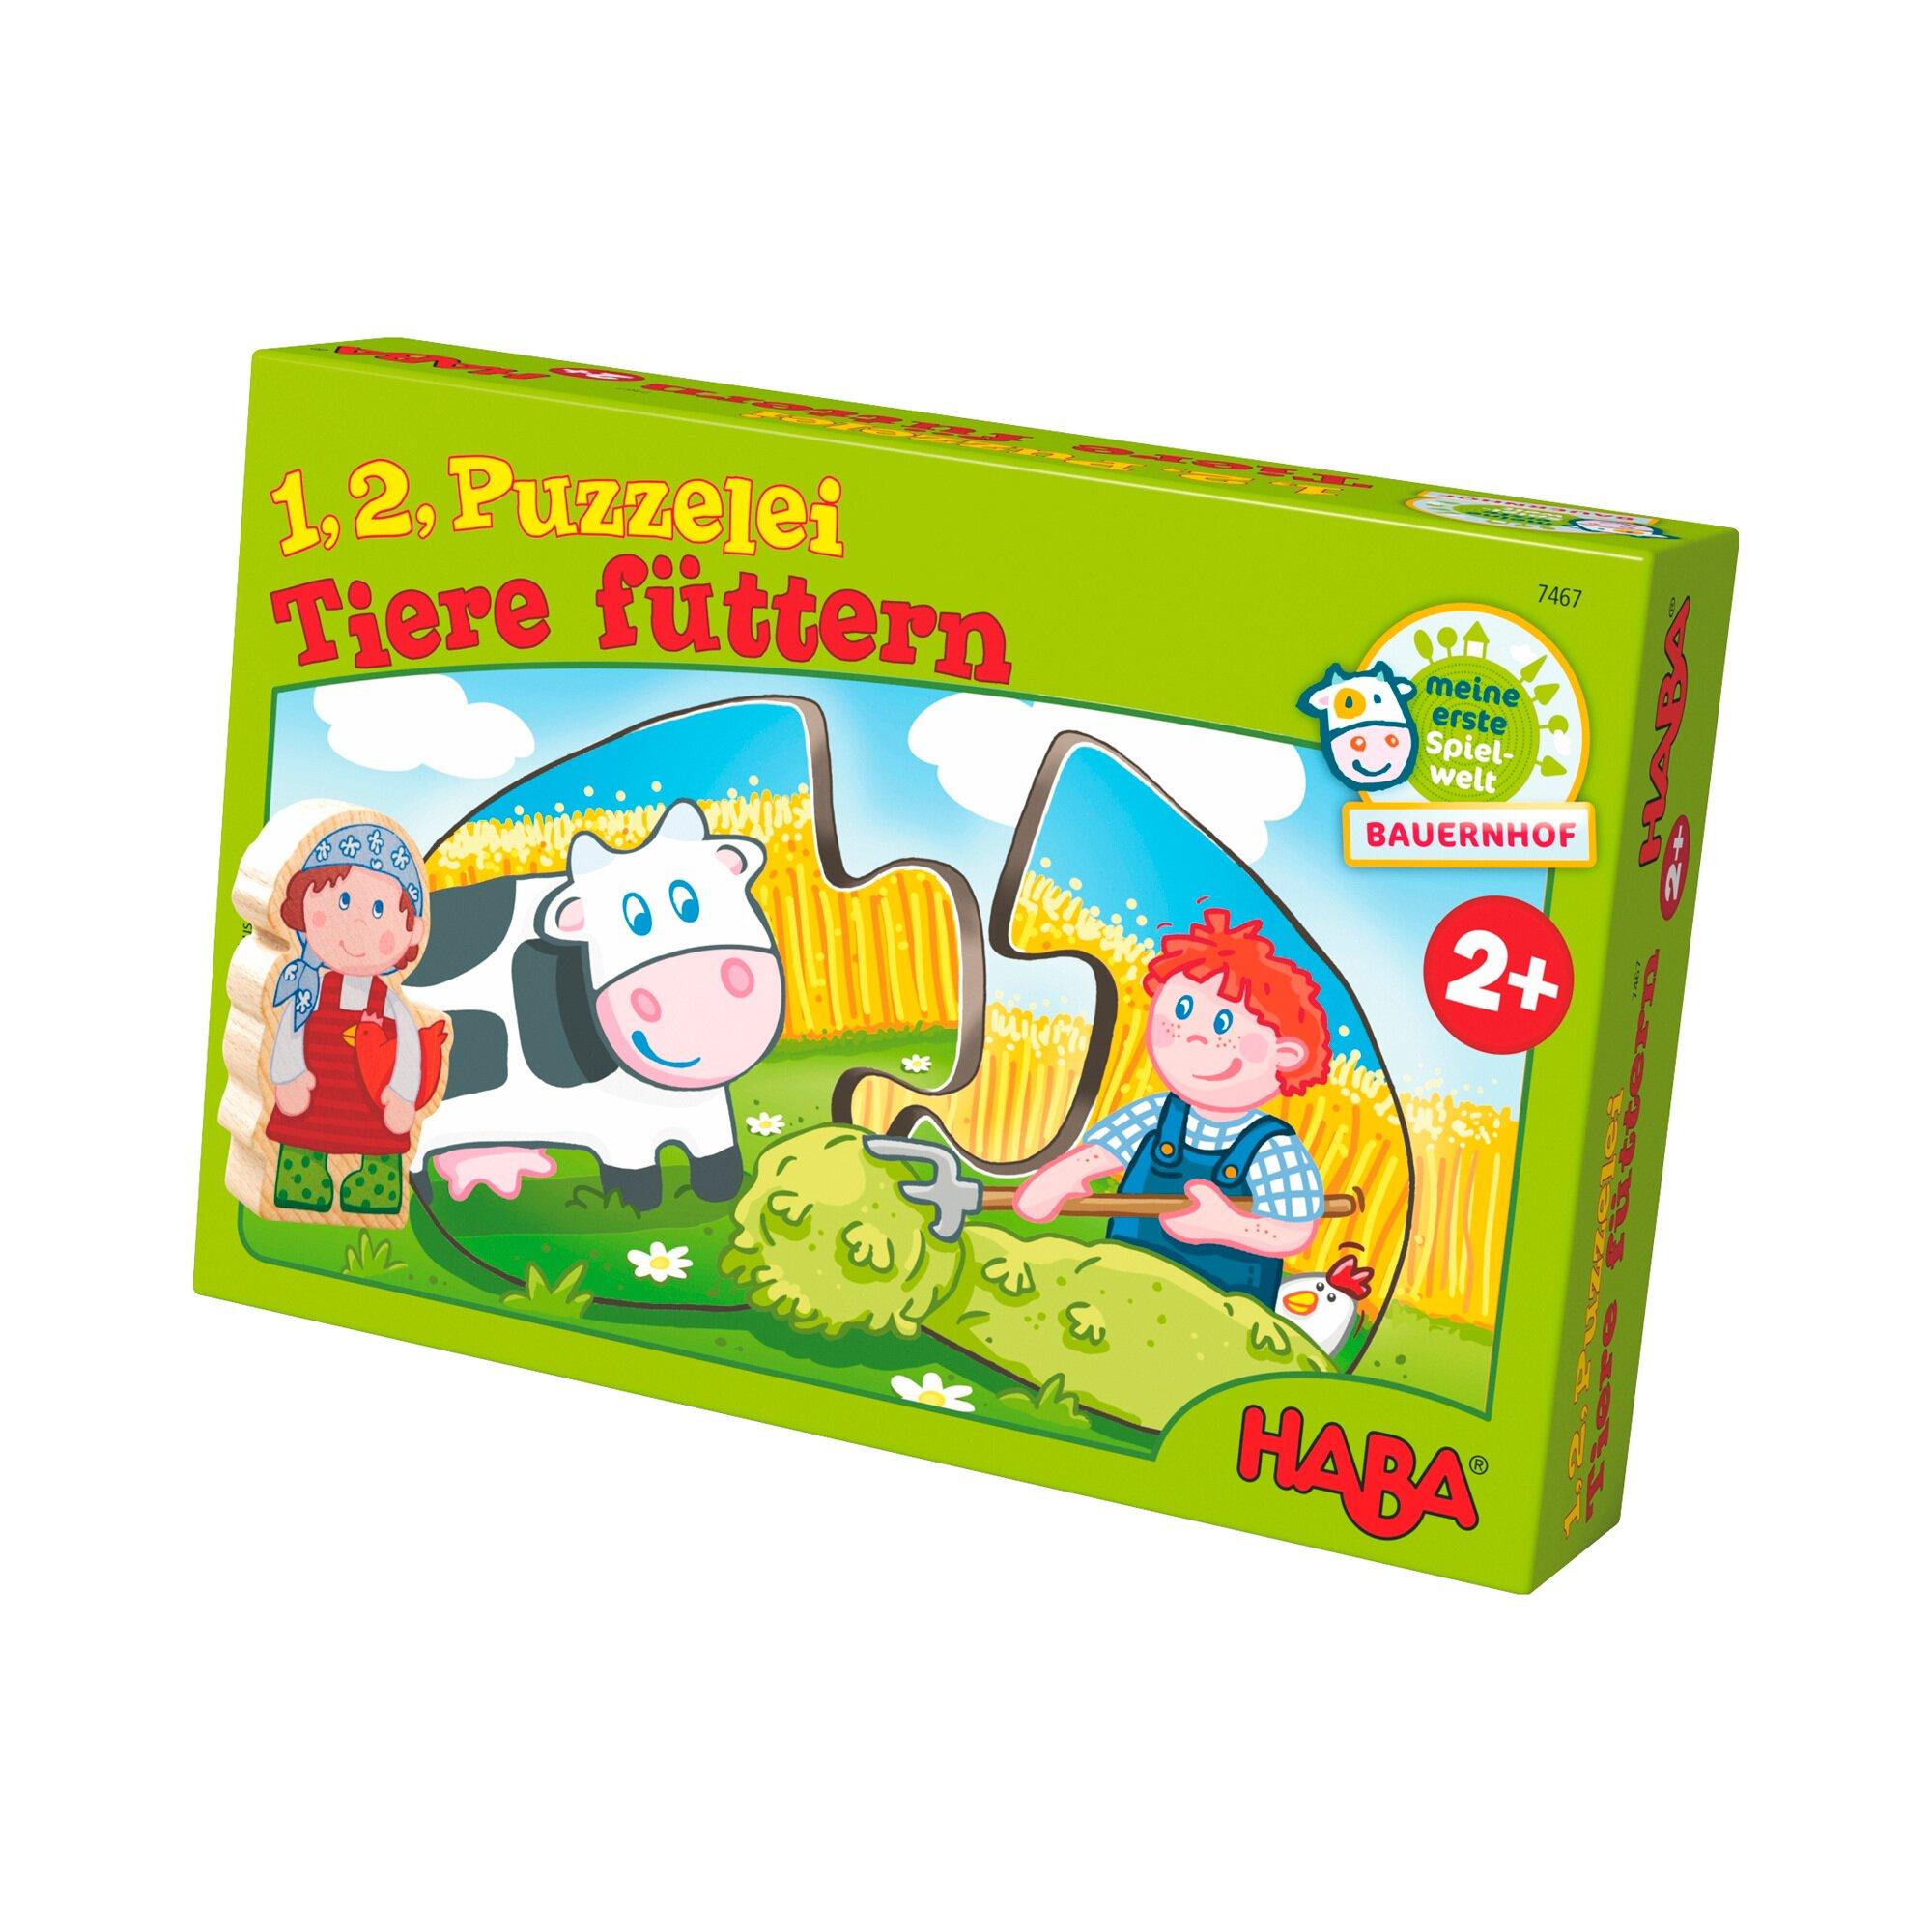 1, 2, Puzzelei Tiere füttern (7467)